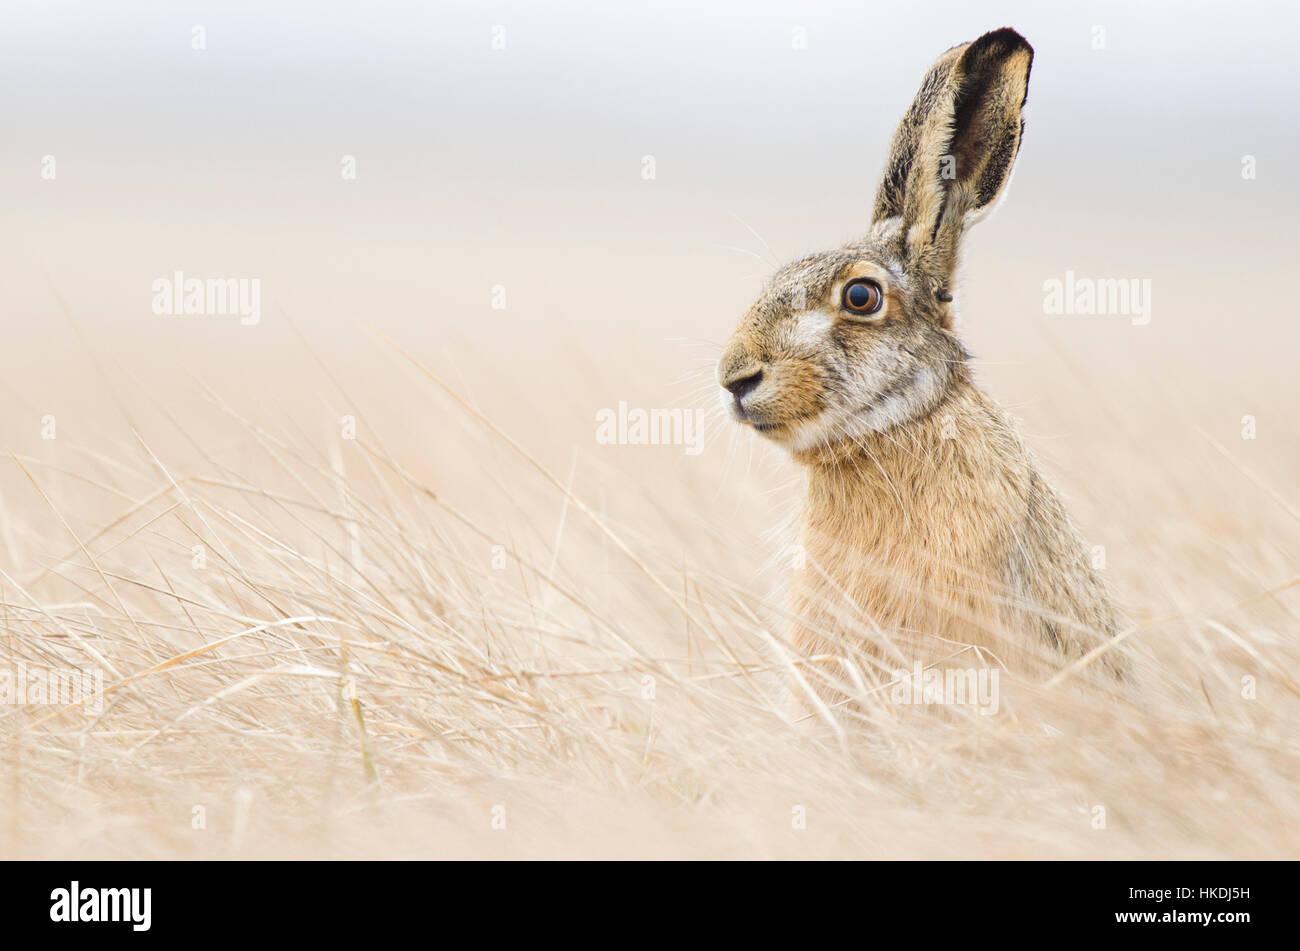 European hare (Lepus europaeus) sitting, Lake Neusiedl, Seewinkel, Burgenland, Austria - Stock Image